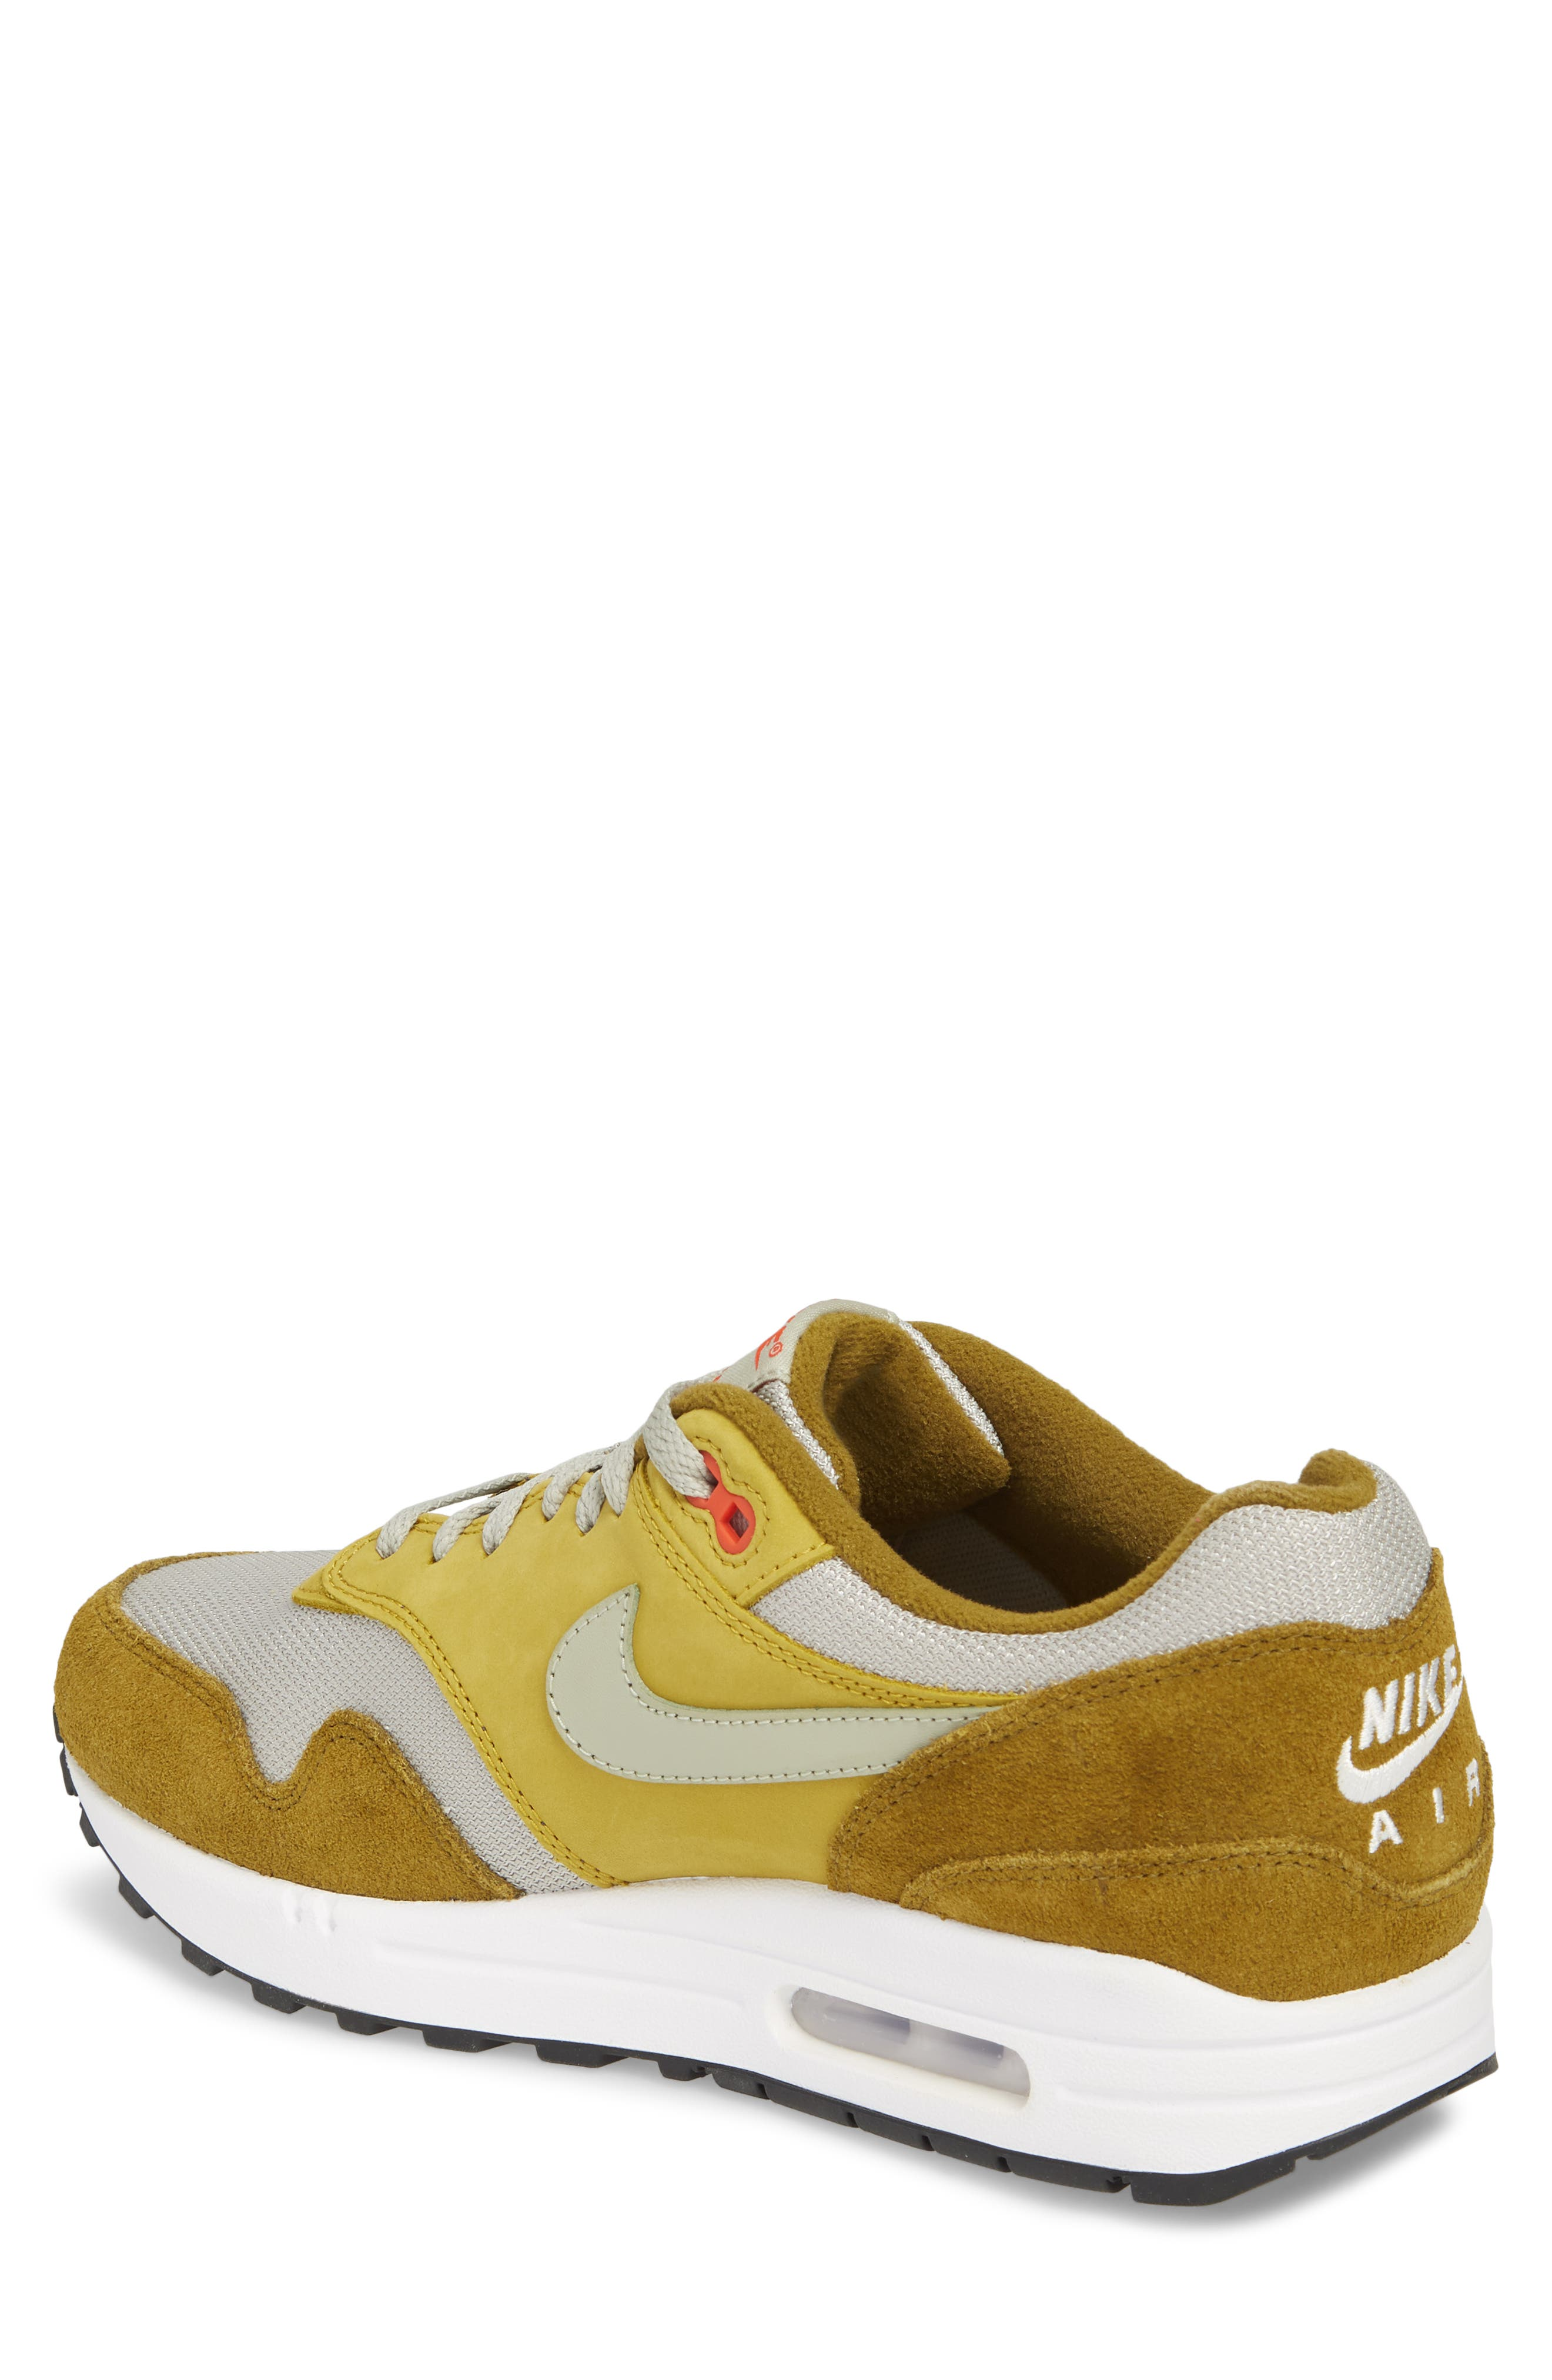 Air Max 1 Premium Retro Sneaker,                             Alternate thumbnail 3, color,